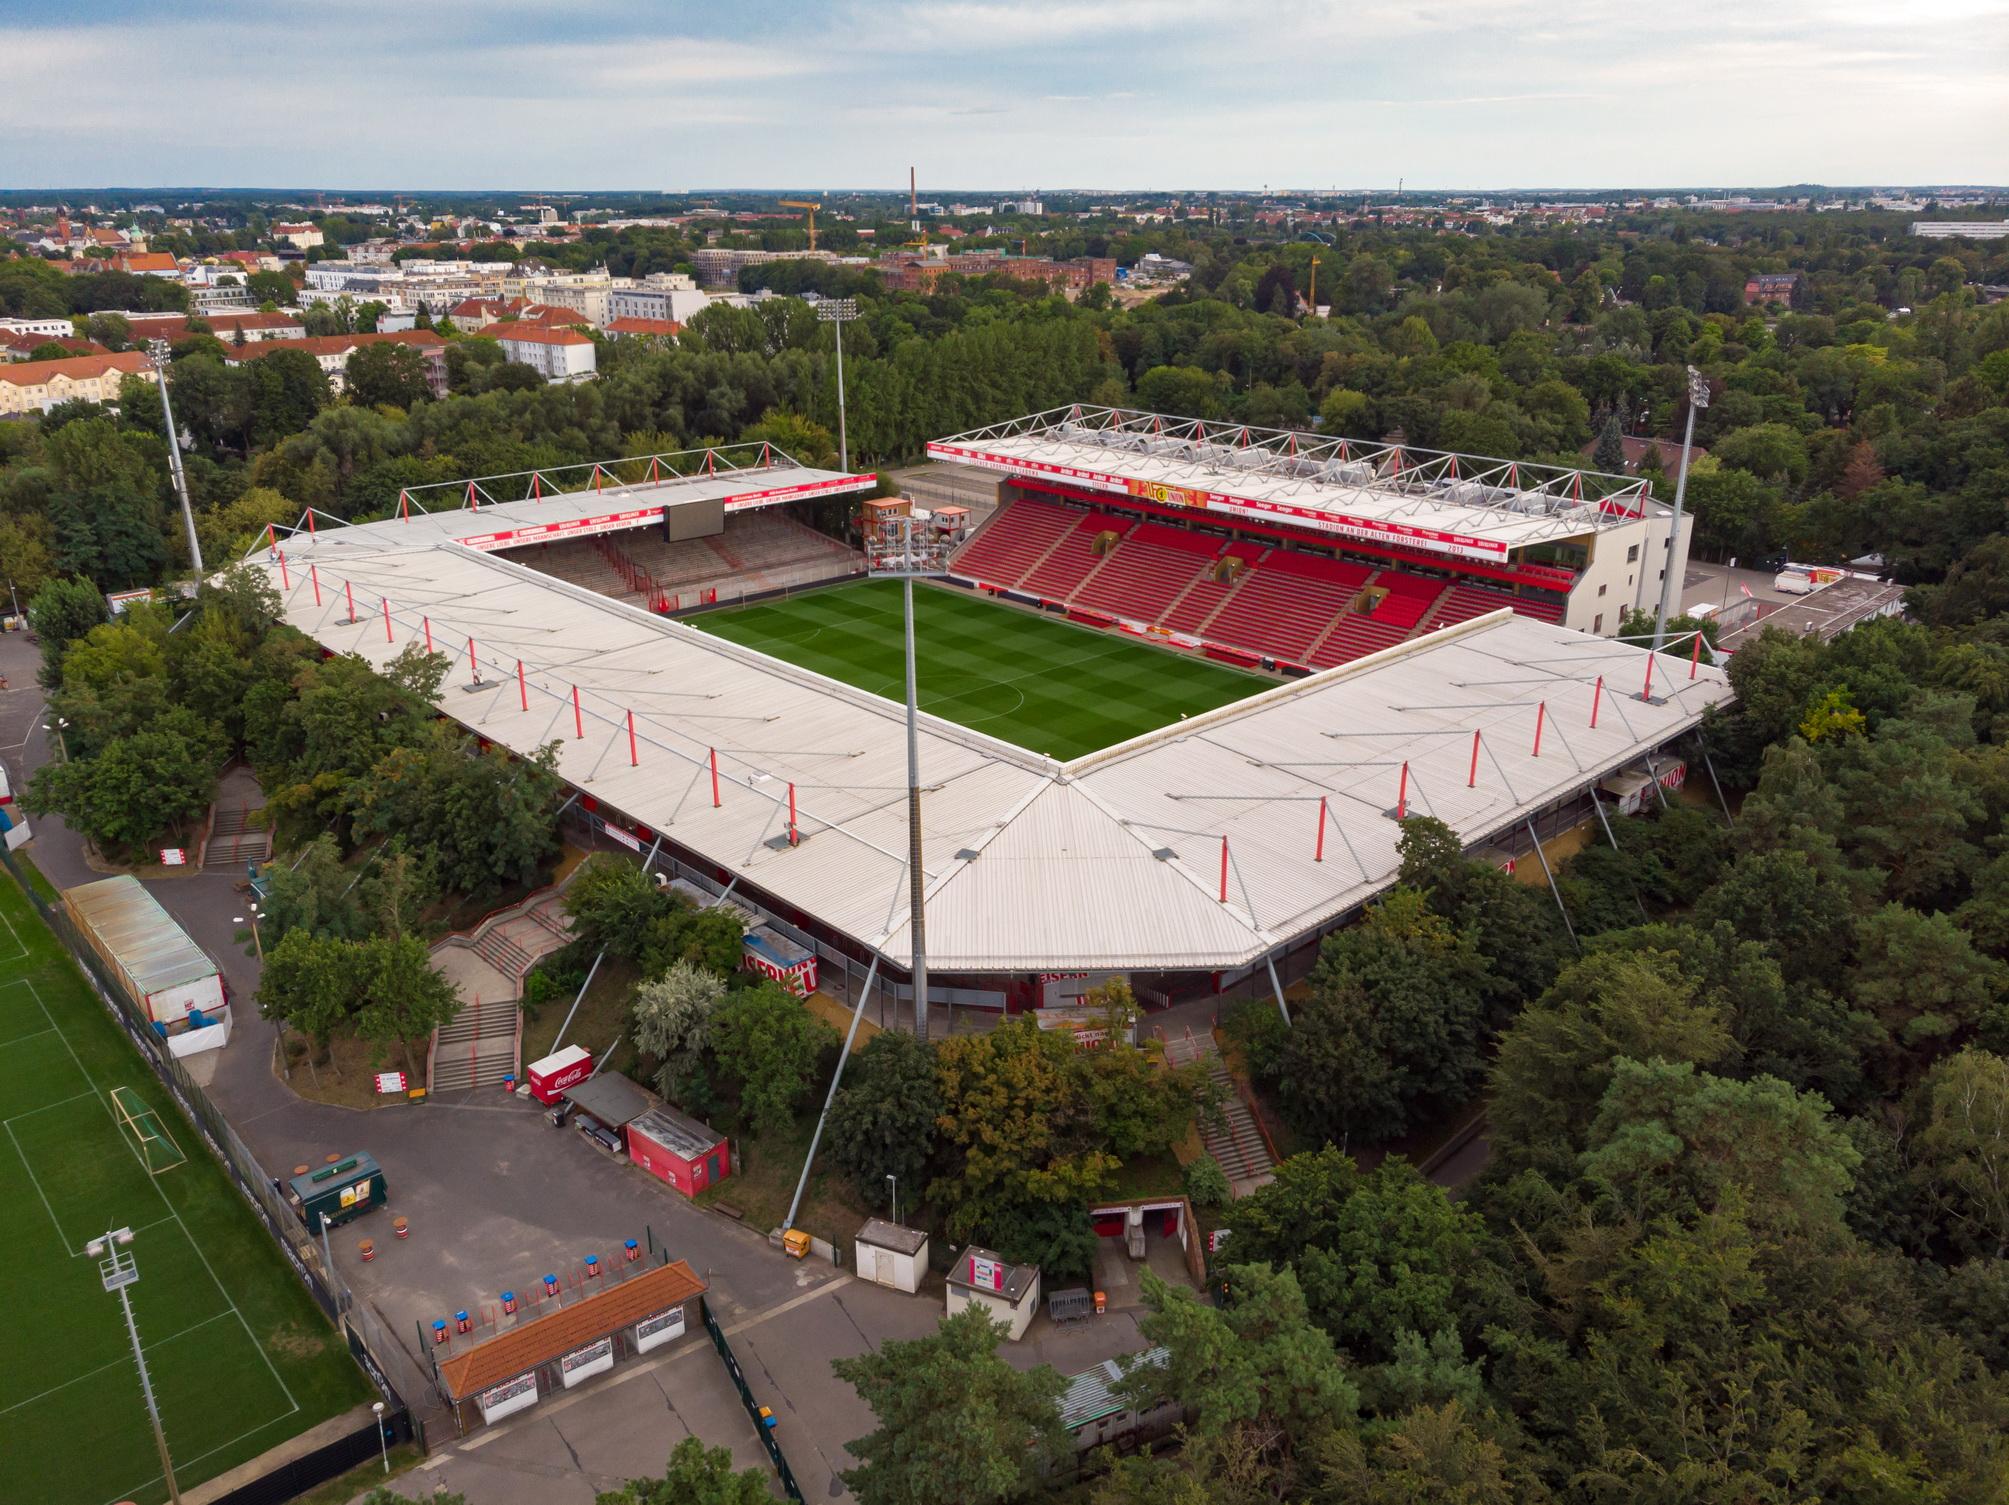 bundesliga-3-tur-union-berlin-borussiya-dortmund-31082019-pered-matchem